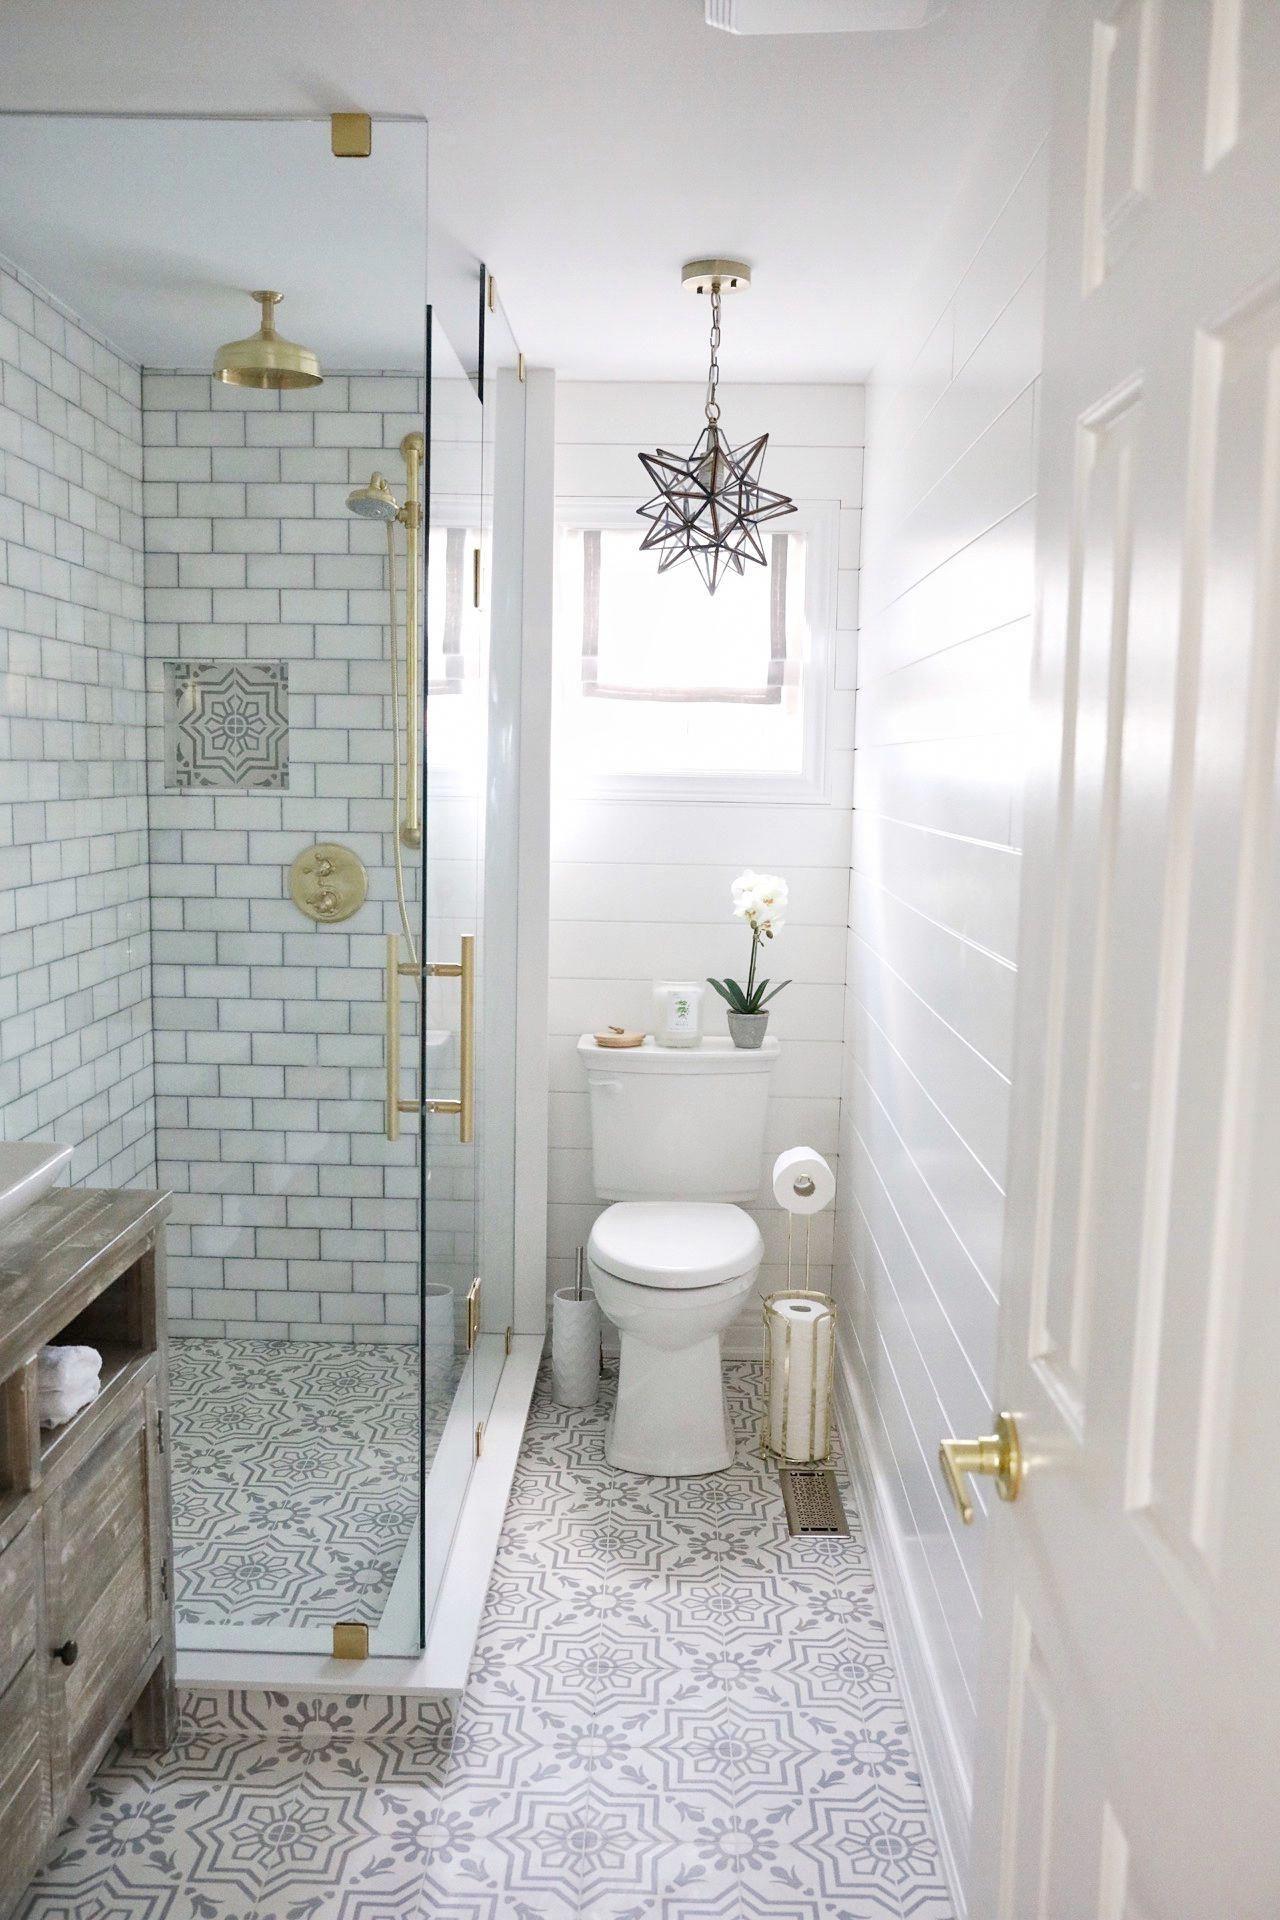 A Simply Beautiful Bathroom Makeover Kidsplayroom In 2020 Minimalist Small Bathrooms Bathroom Design Small Bathroom Interior Design